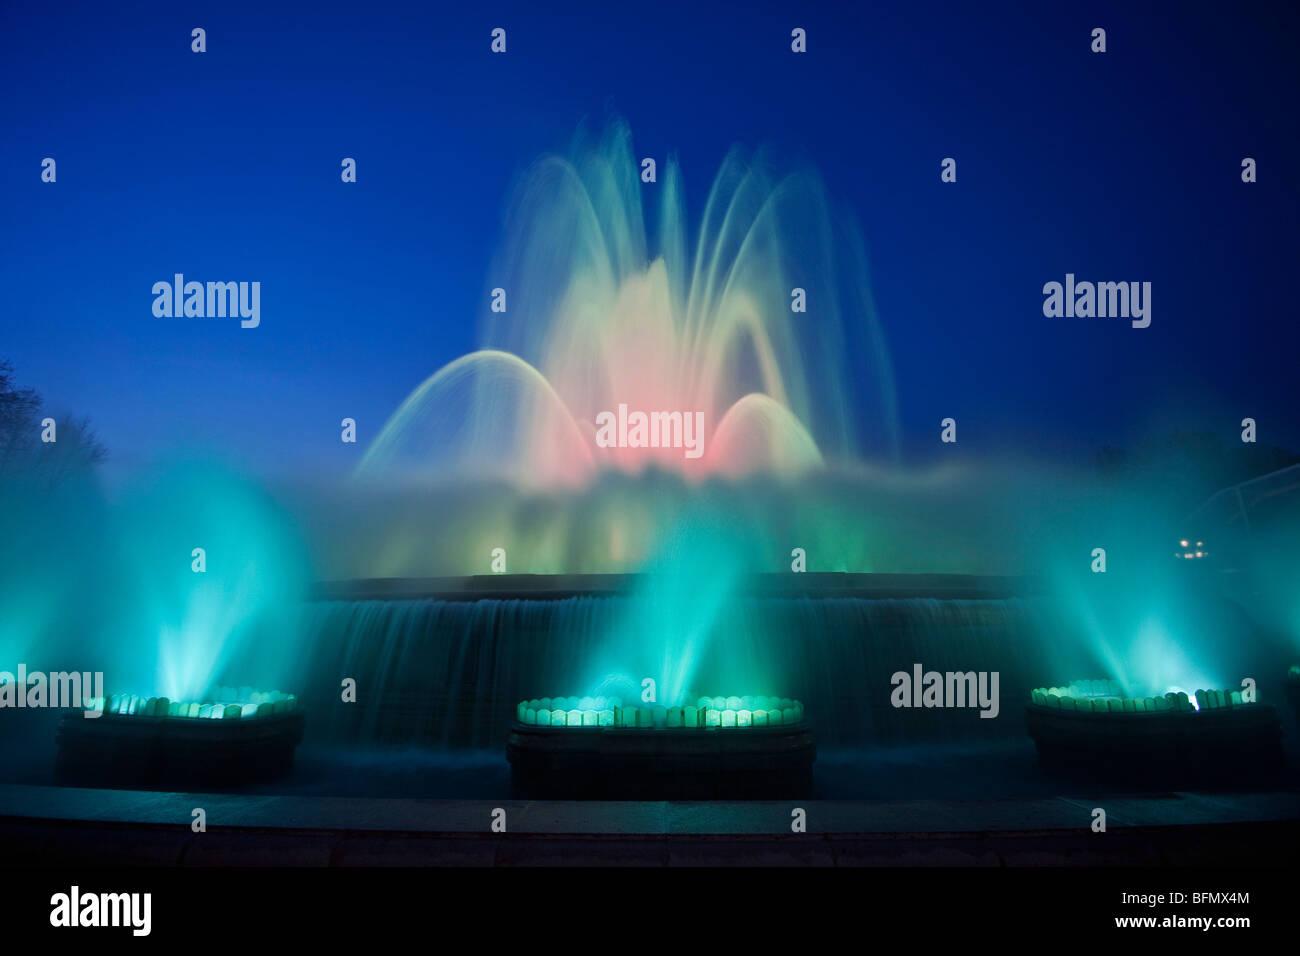 Spain, Cataluna, Barcelona, Santa Eulalia, Sants Montjuic, flood lit fountains at the National Art Museum of Catalonia - Stock Image